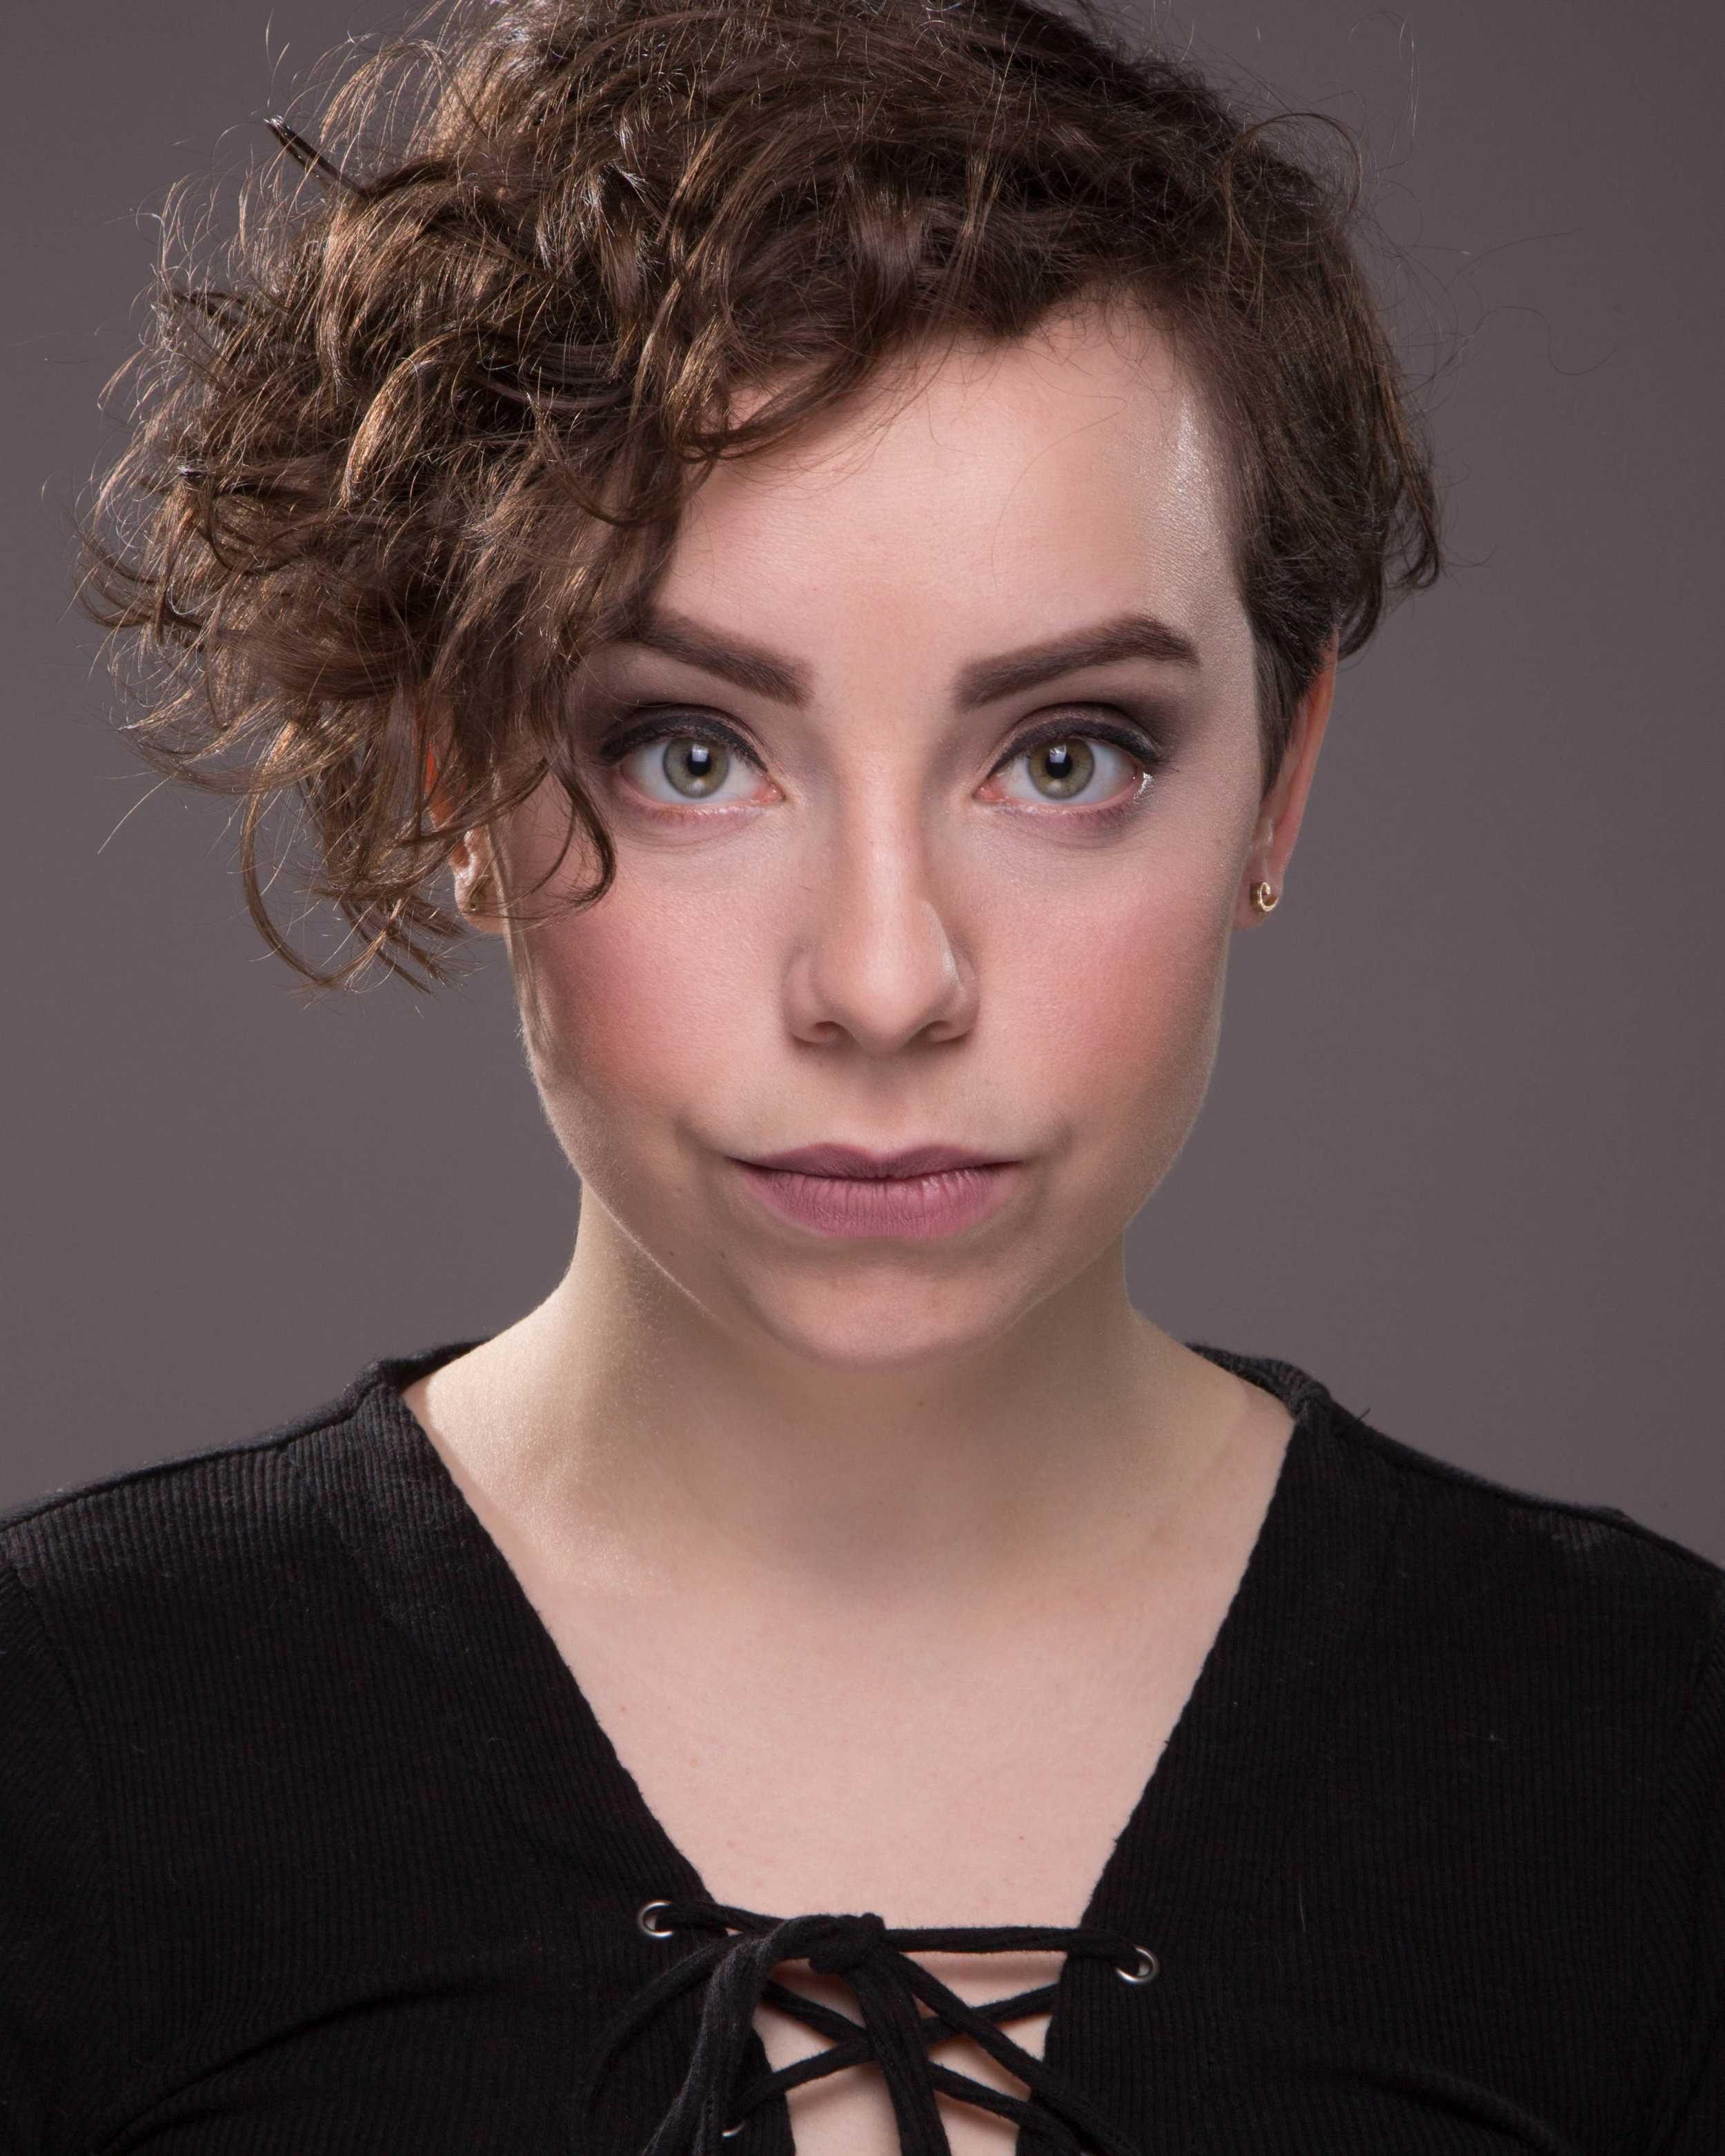 Caitlin Weaver